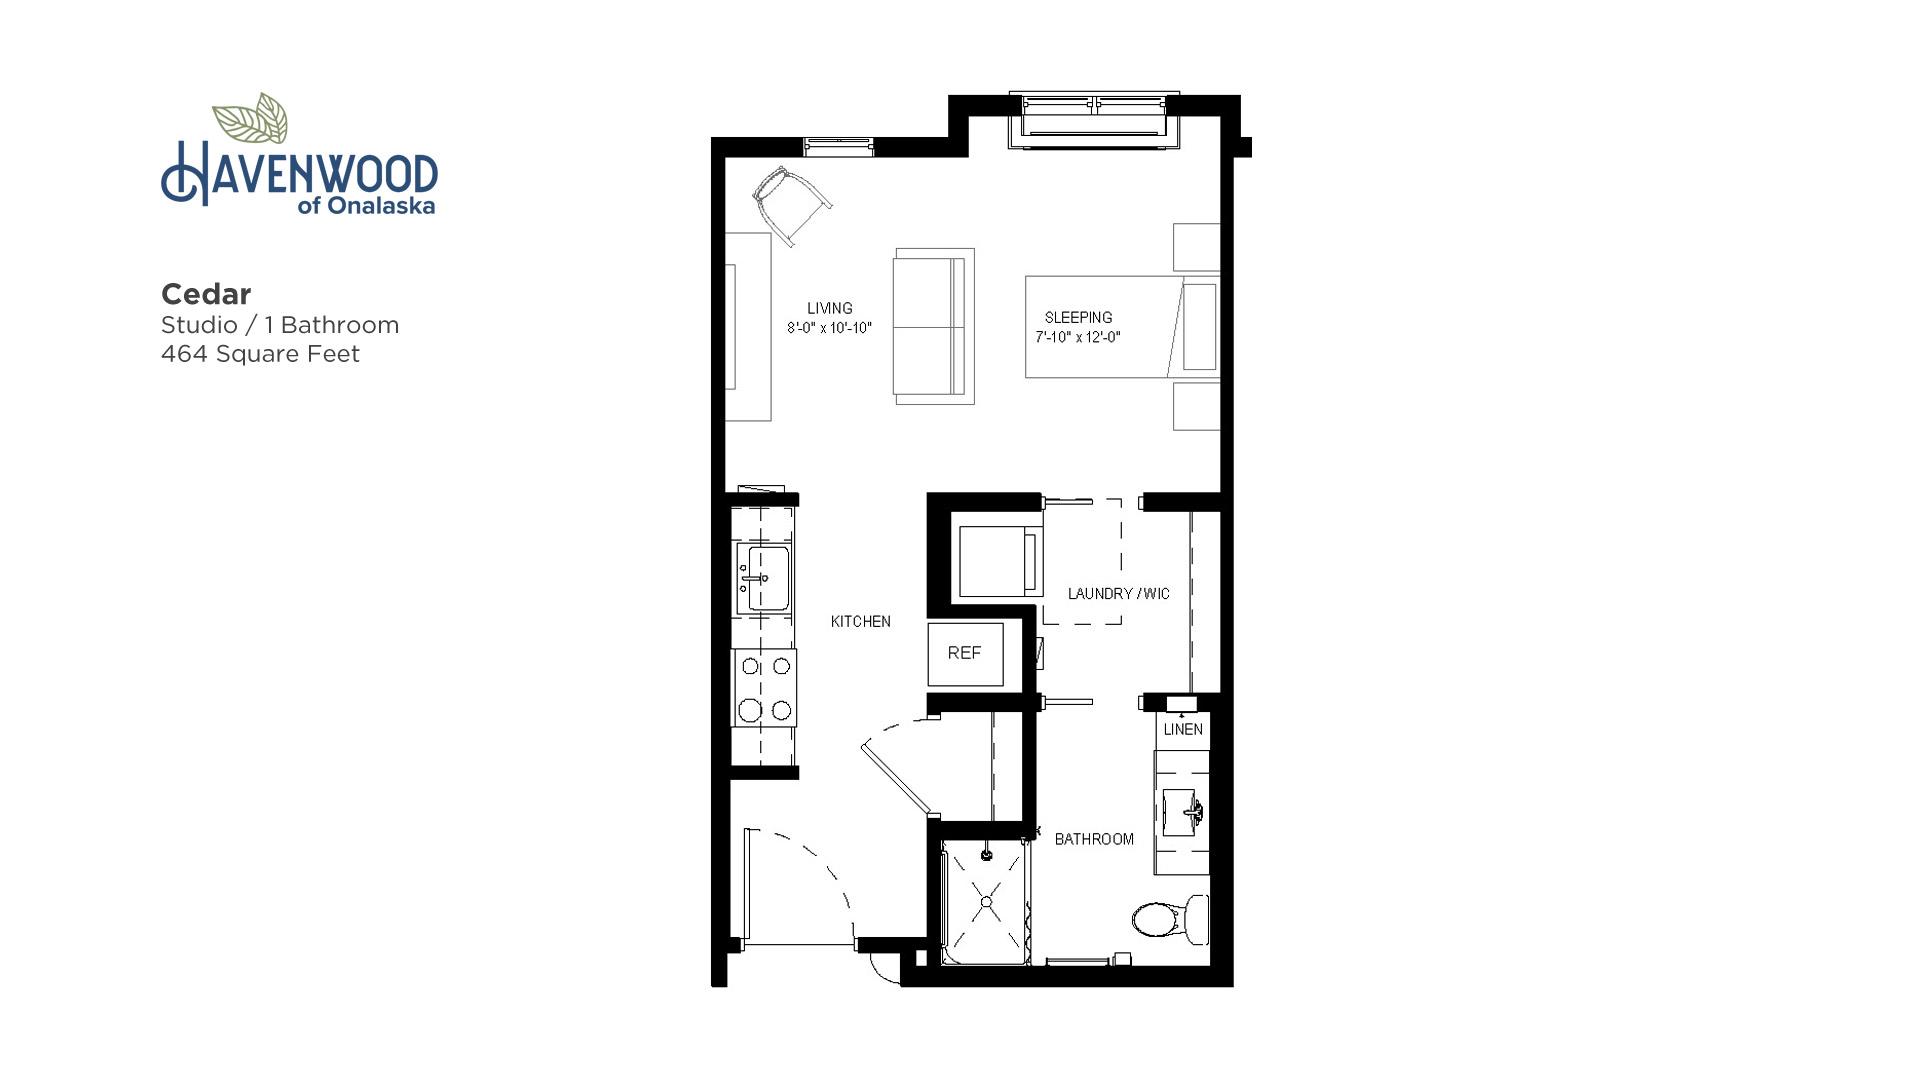 Havenwood of Onalaska Cedar Floor Plan